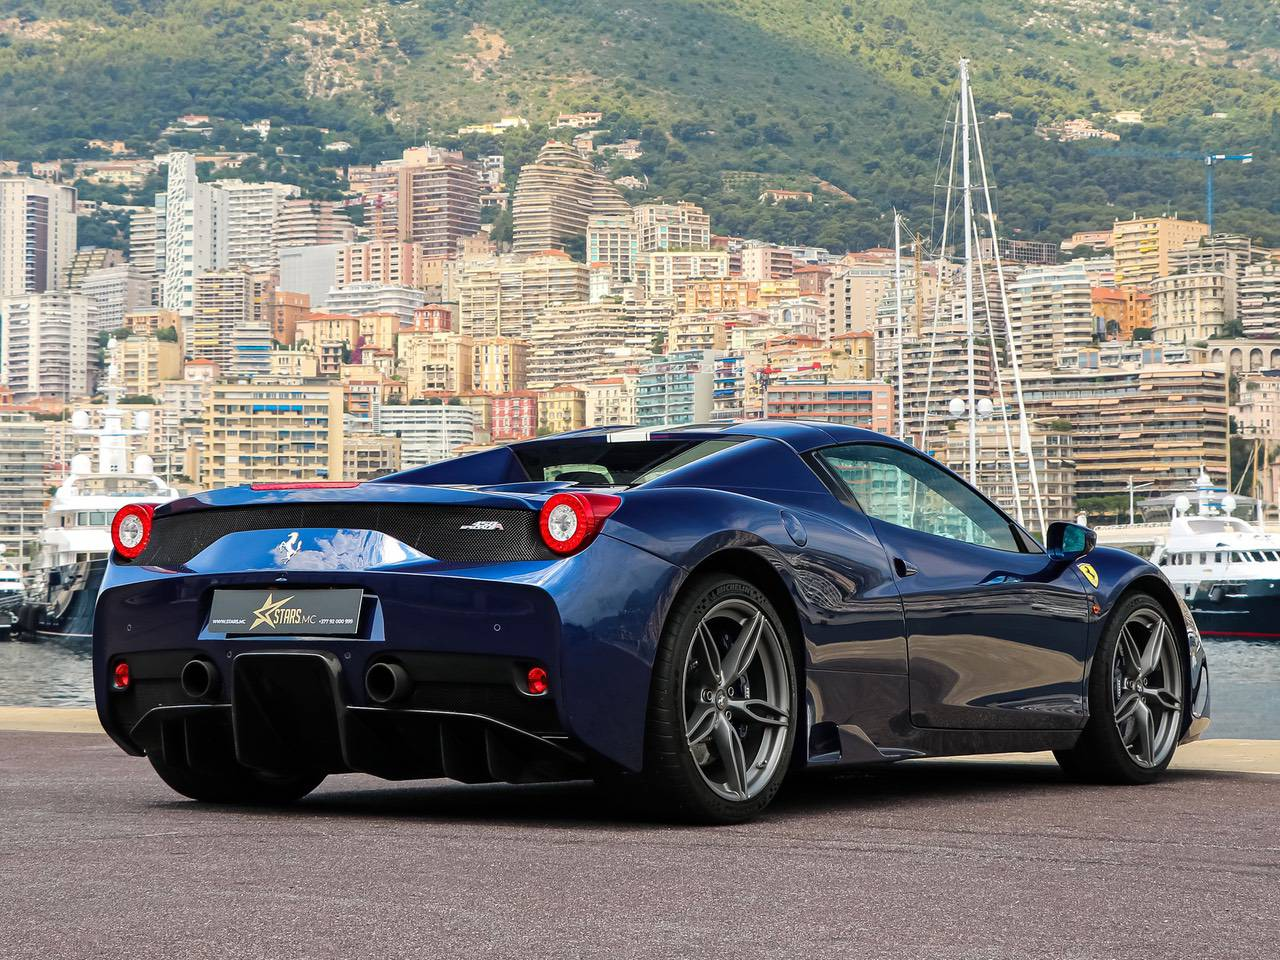 Ferrari-458-Speciale-Spider-A-7